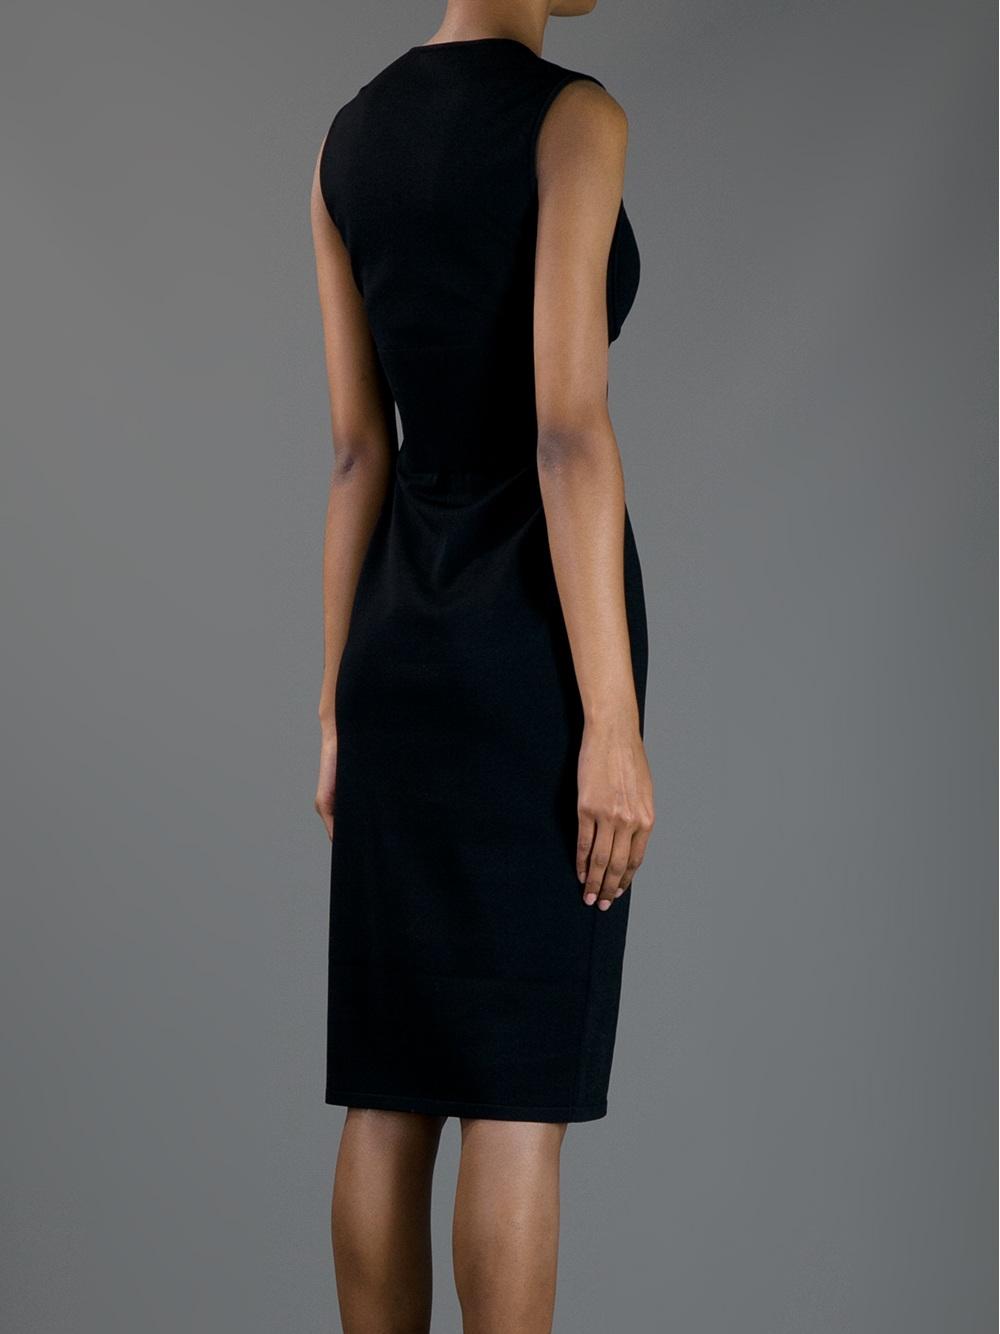 Alexander Mcqueen Fitted Midi Dress In Black Lyst